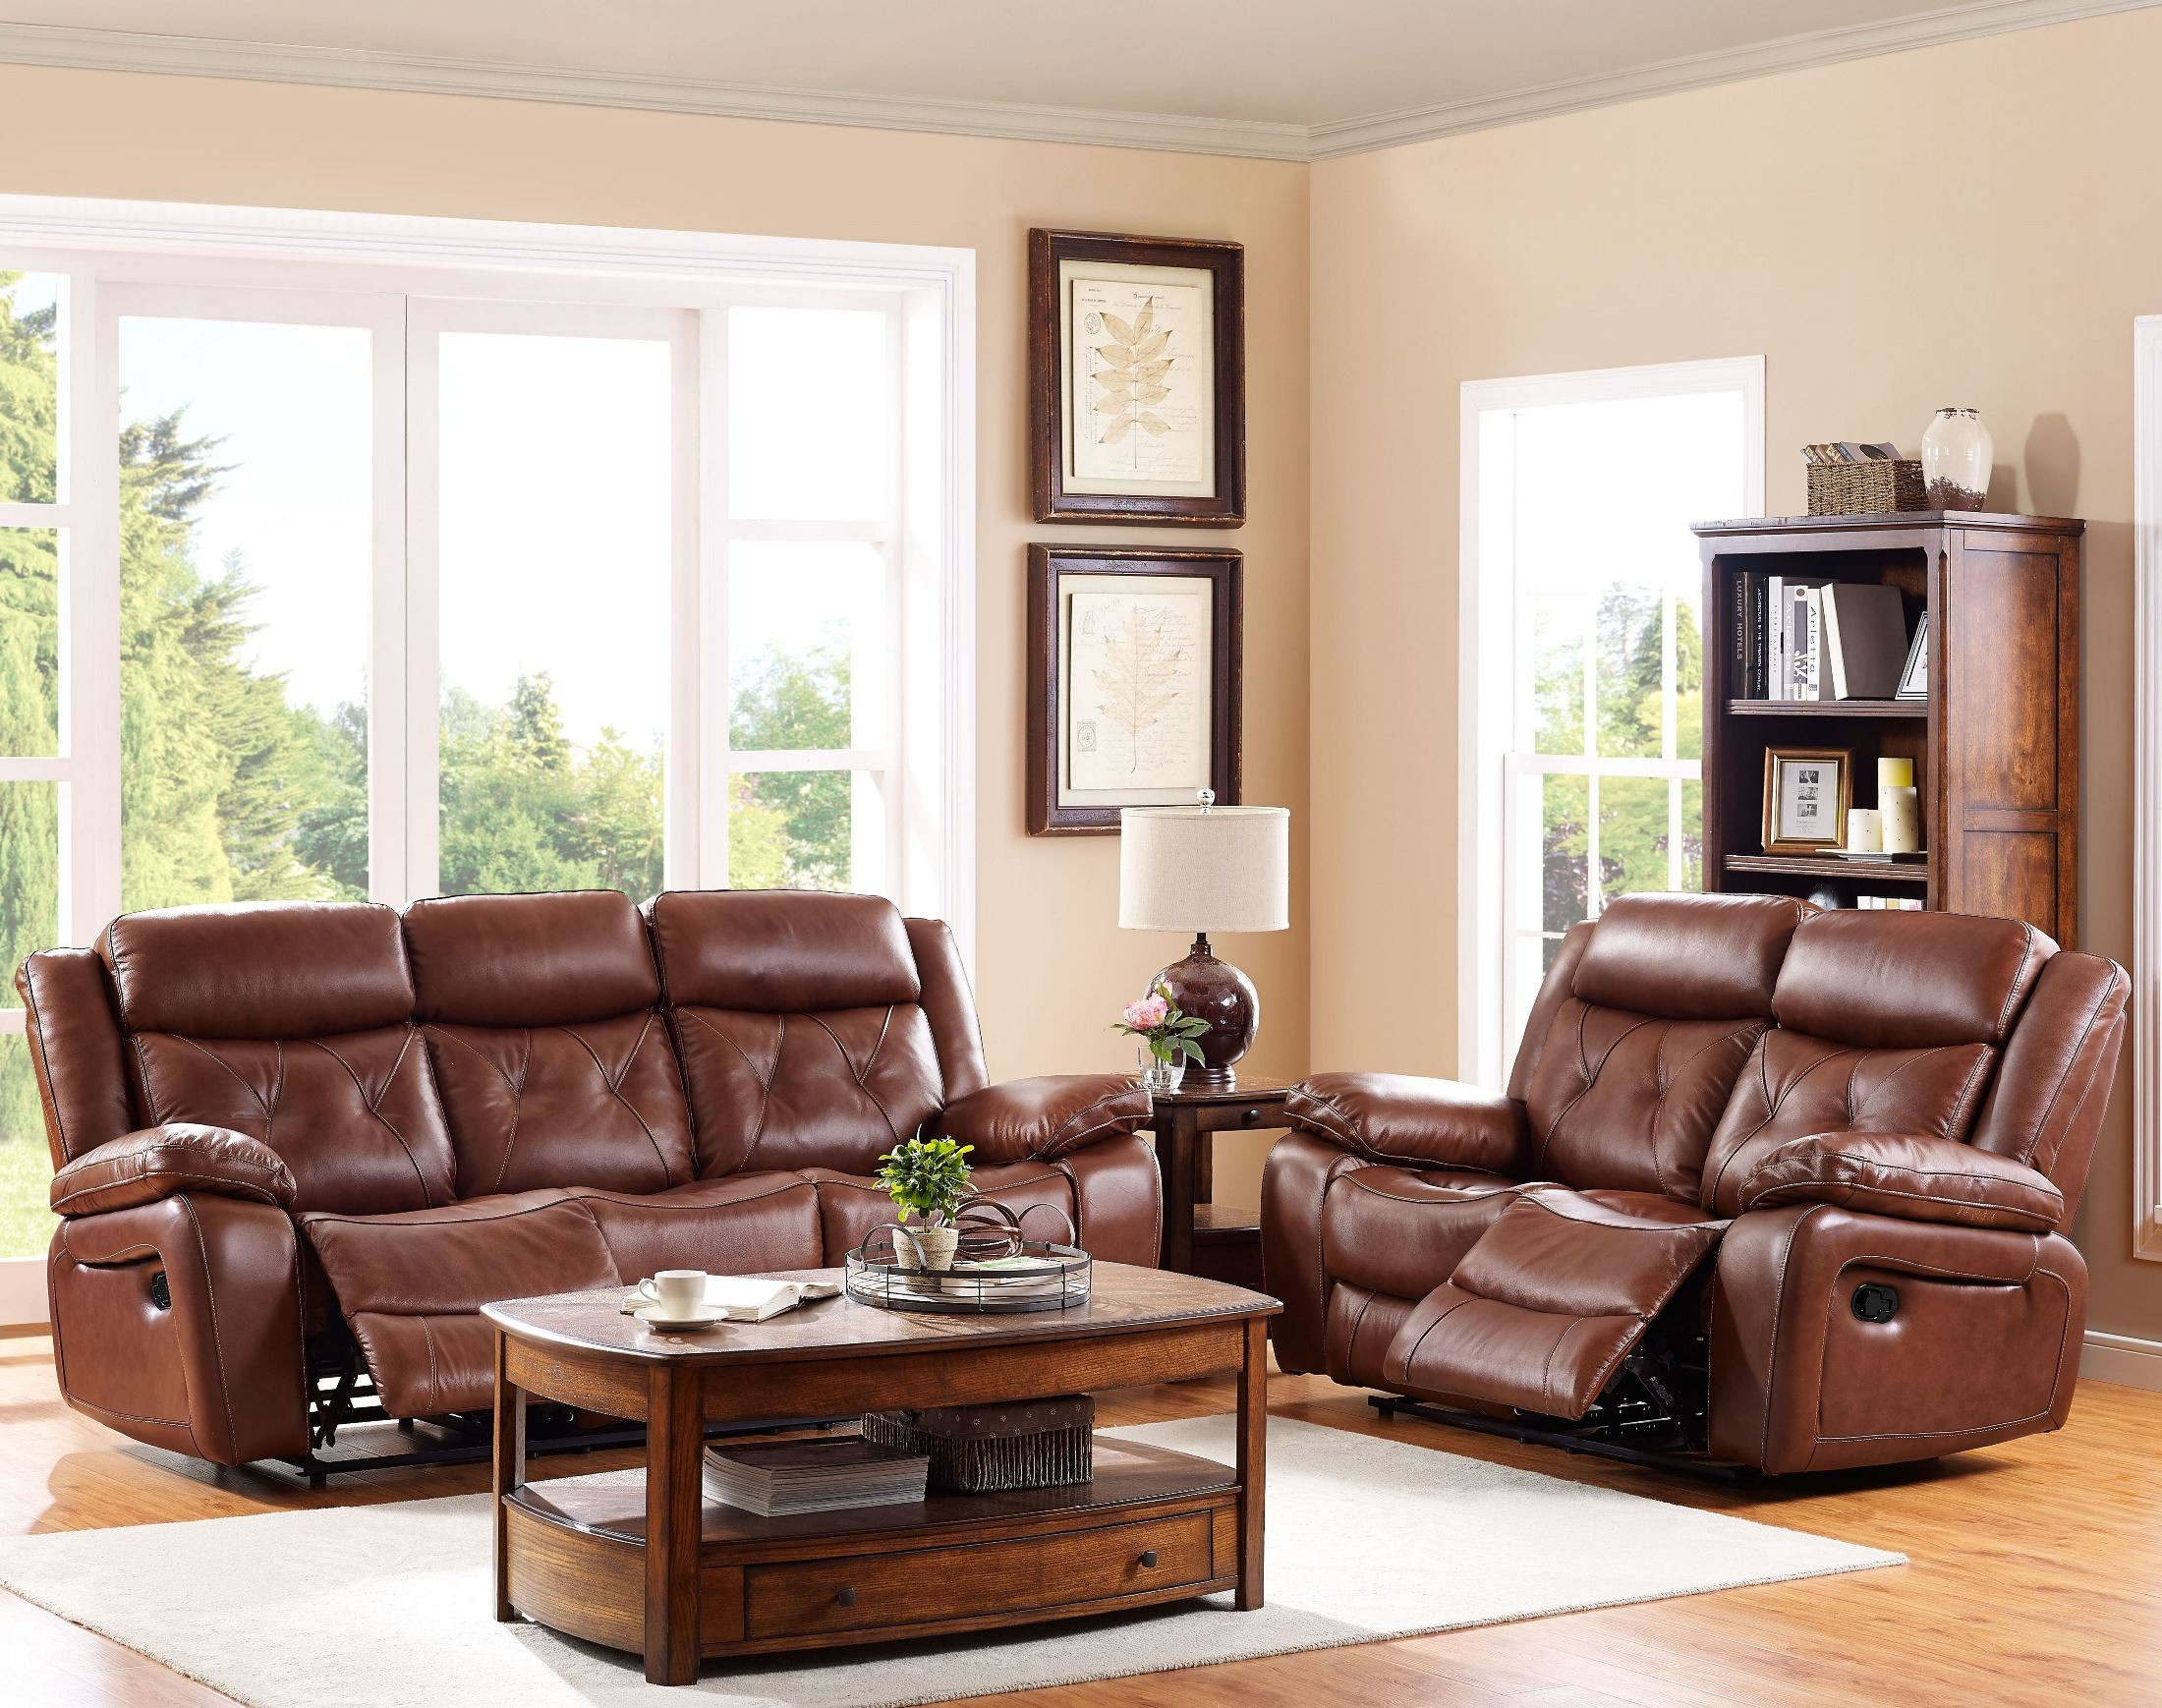 Prime Benedict Light Brown Dual Reclining Living Room Set Andrewgaddart Wooden Chair Designs For Living Room Andrewgaddartcom